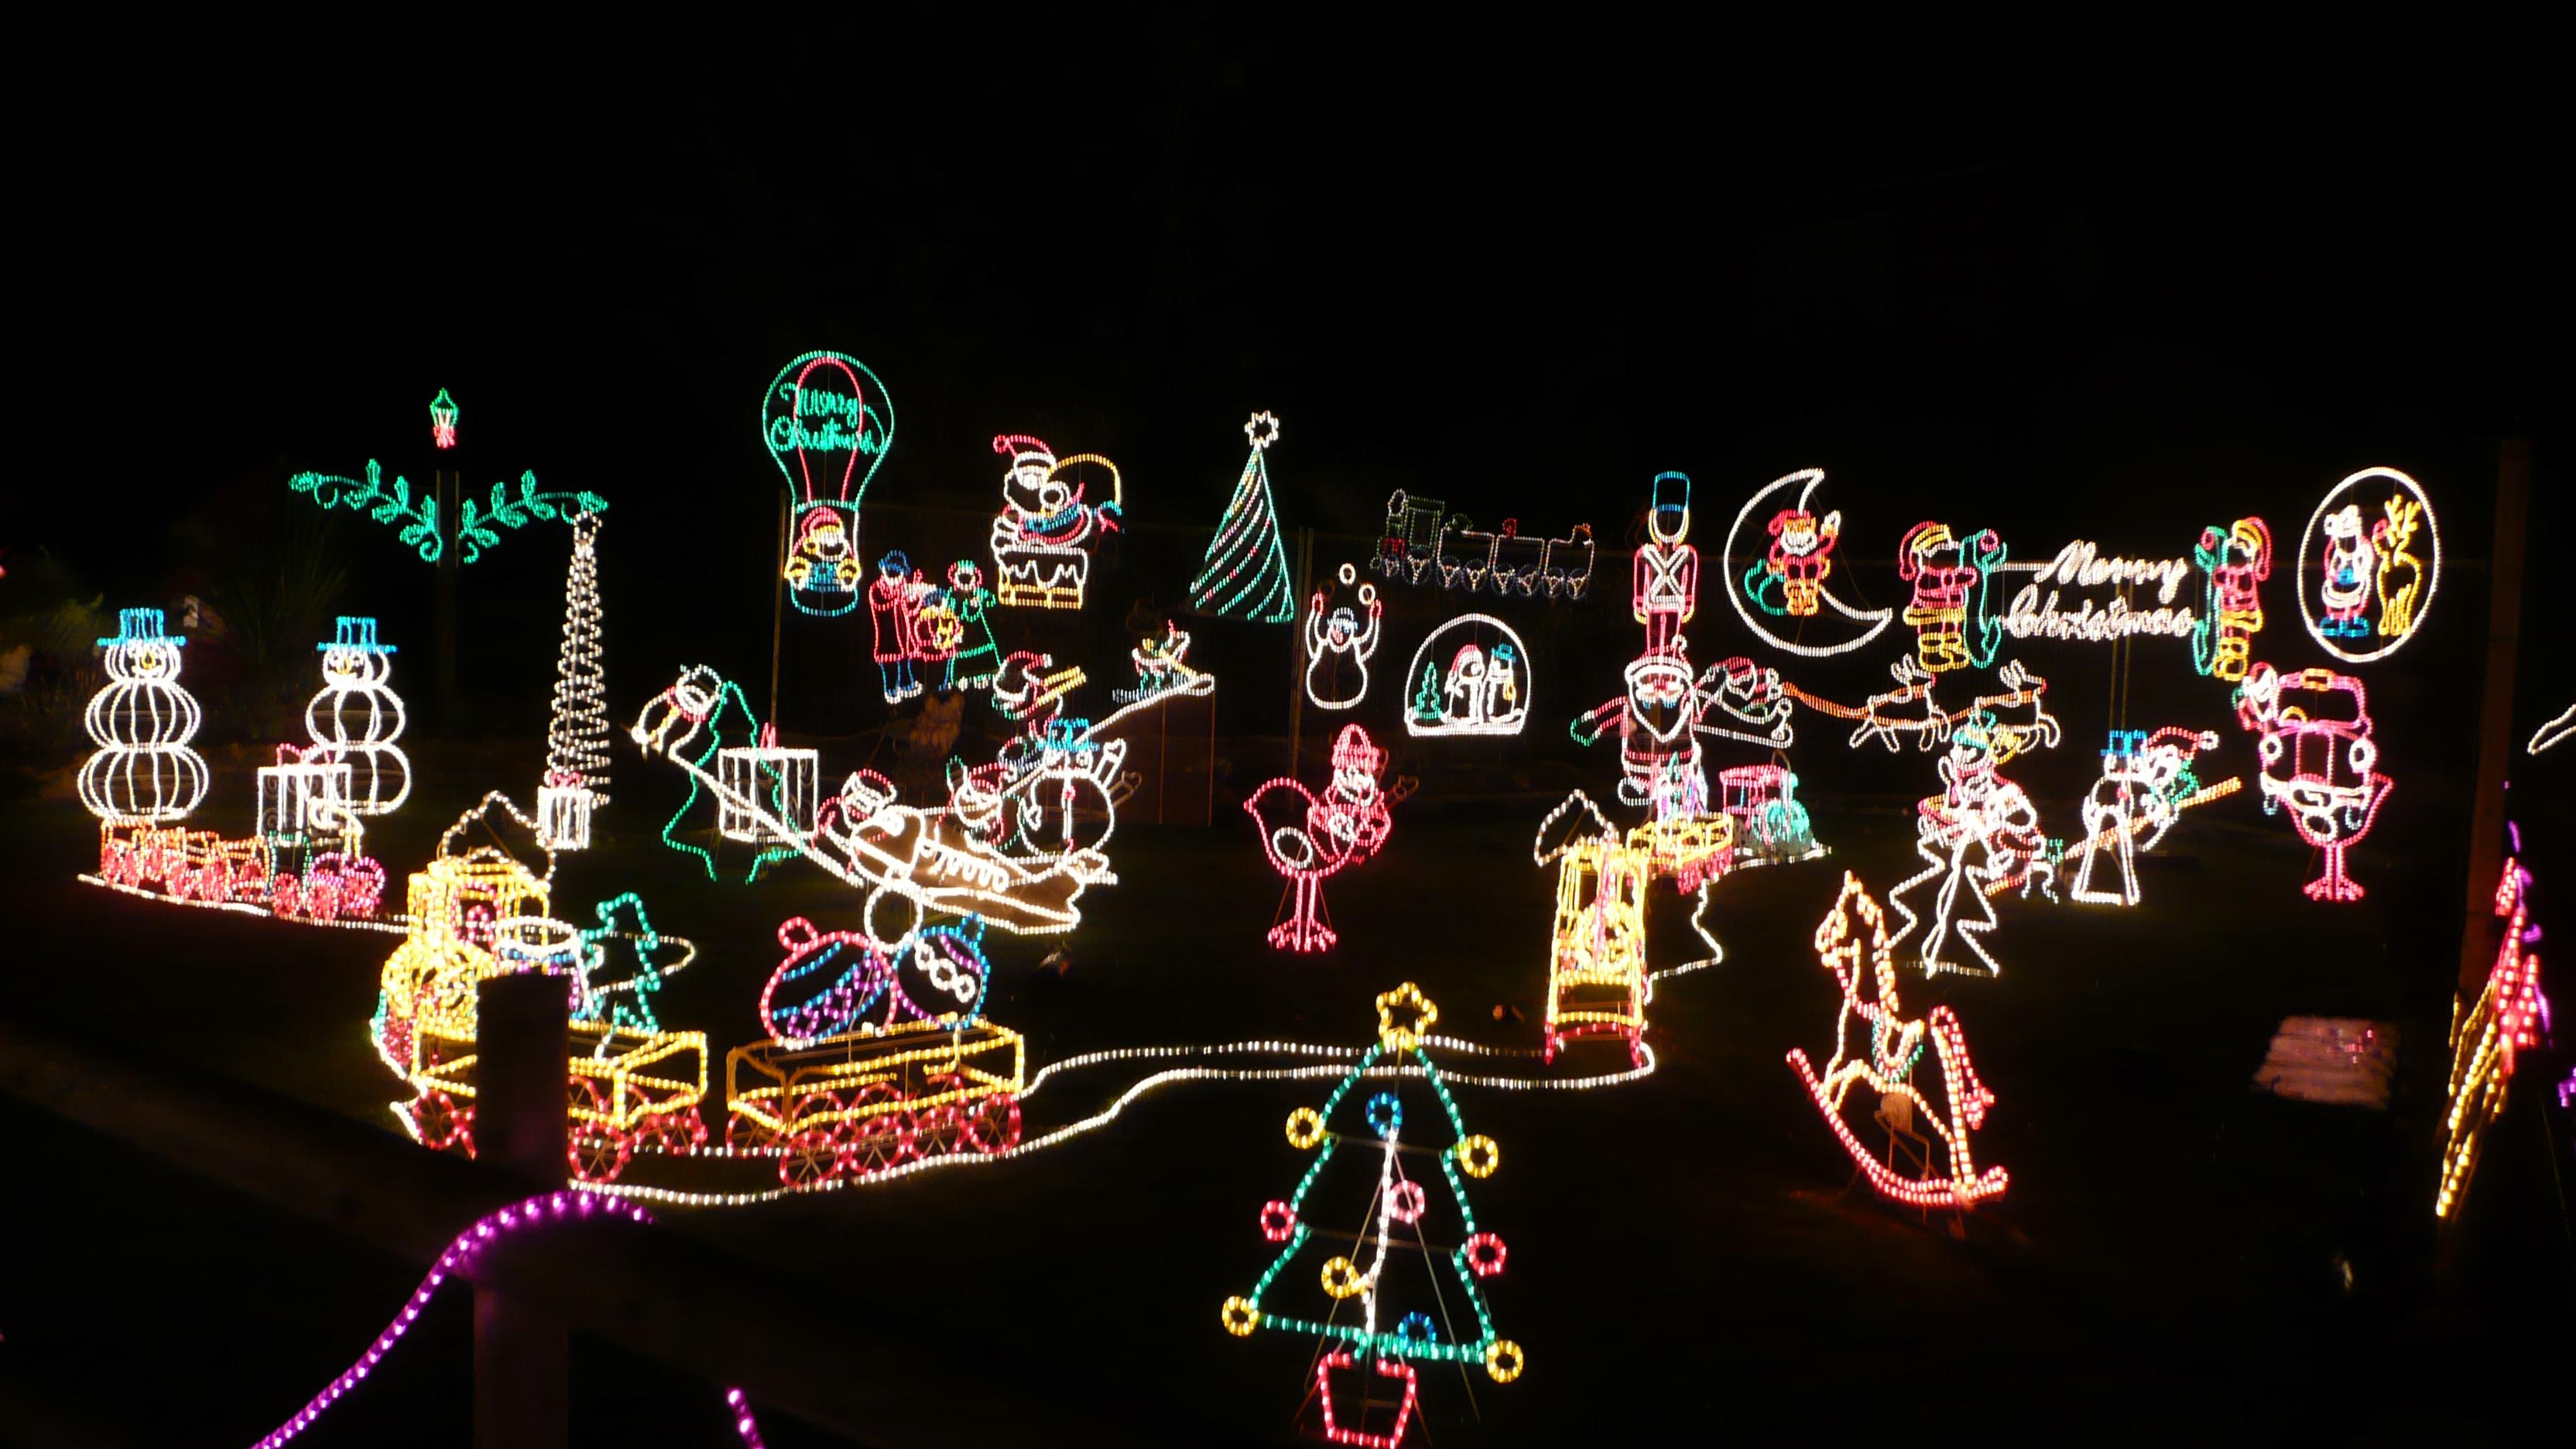 Godshill_Old_World_Tea_Rooms_Christmas_Lights_2